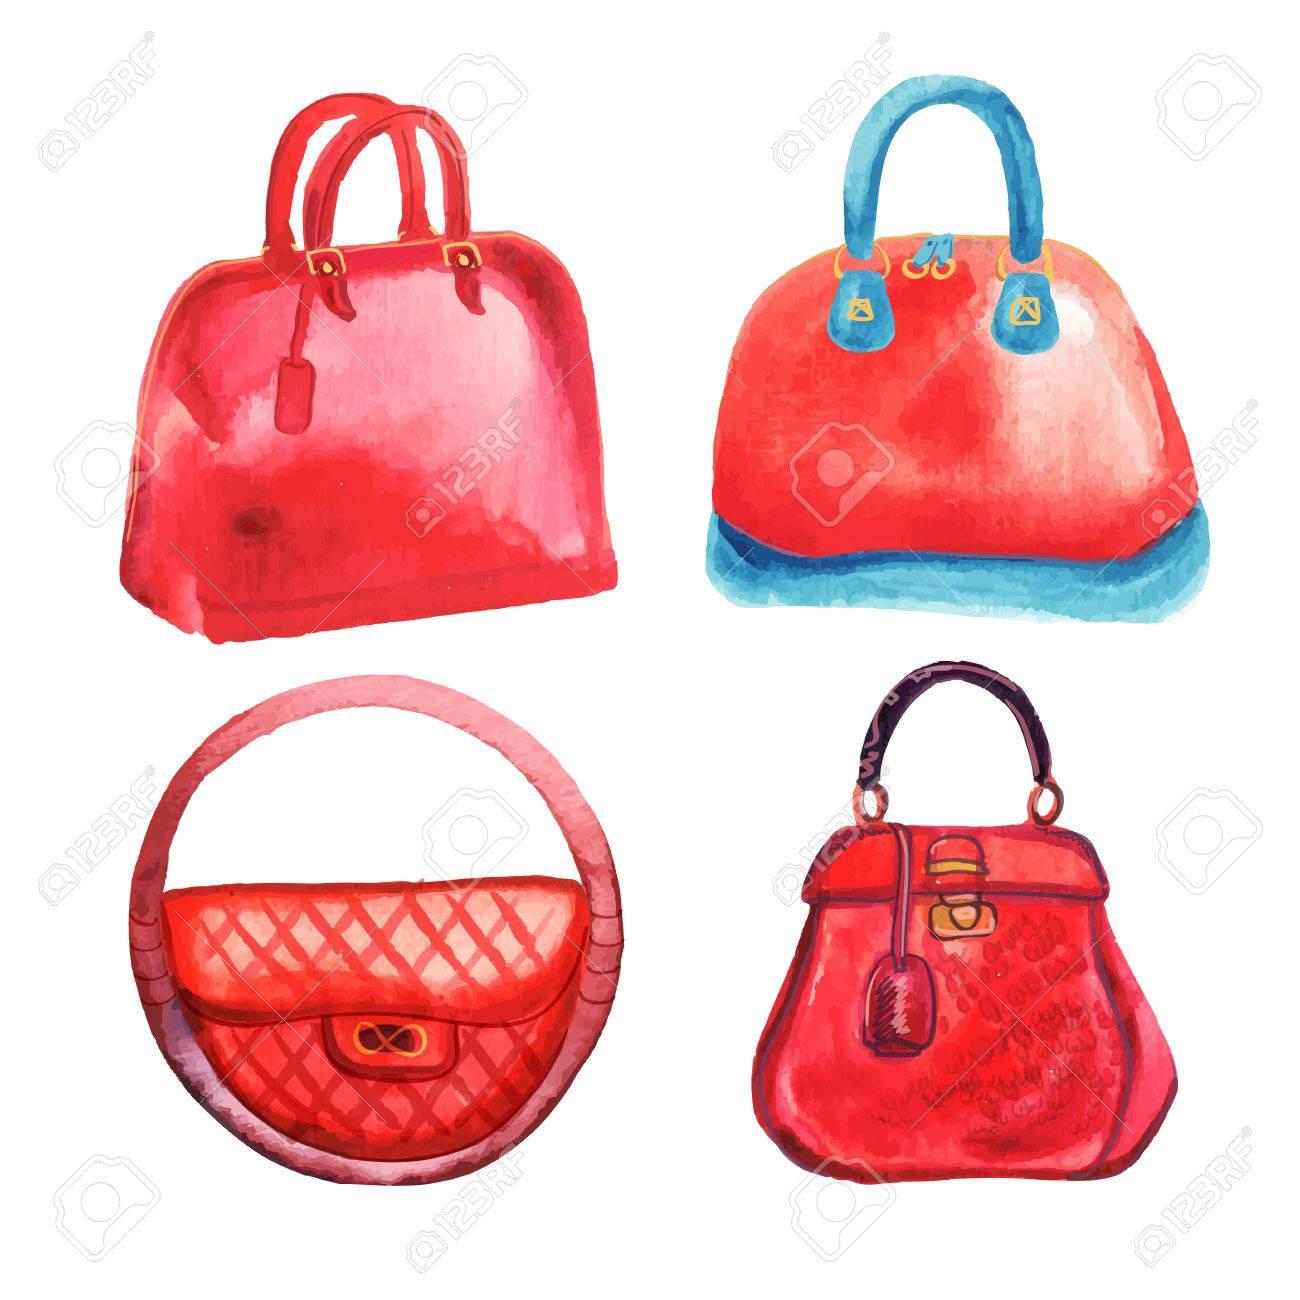 Trendy womens handbags watercolor hand drawn vector illustration - 40527632